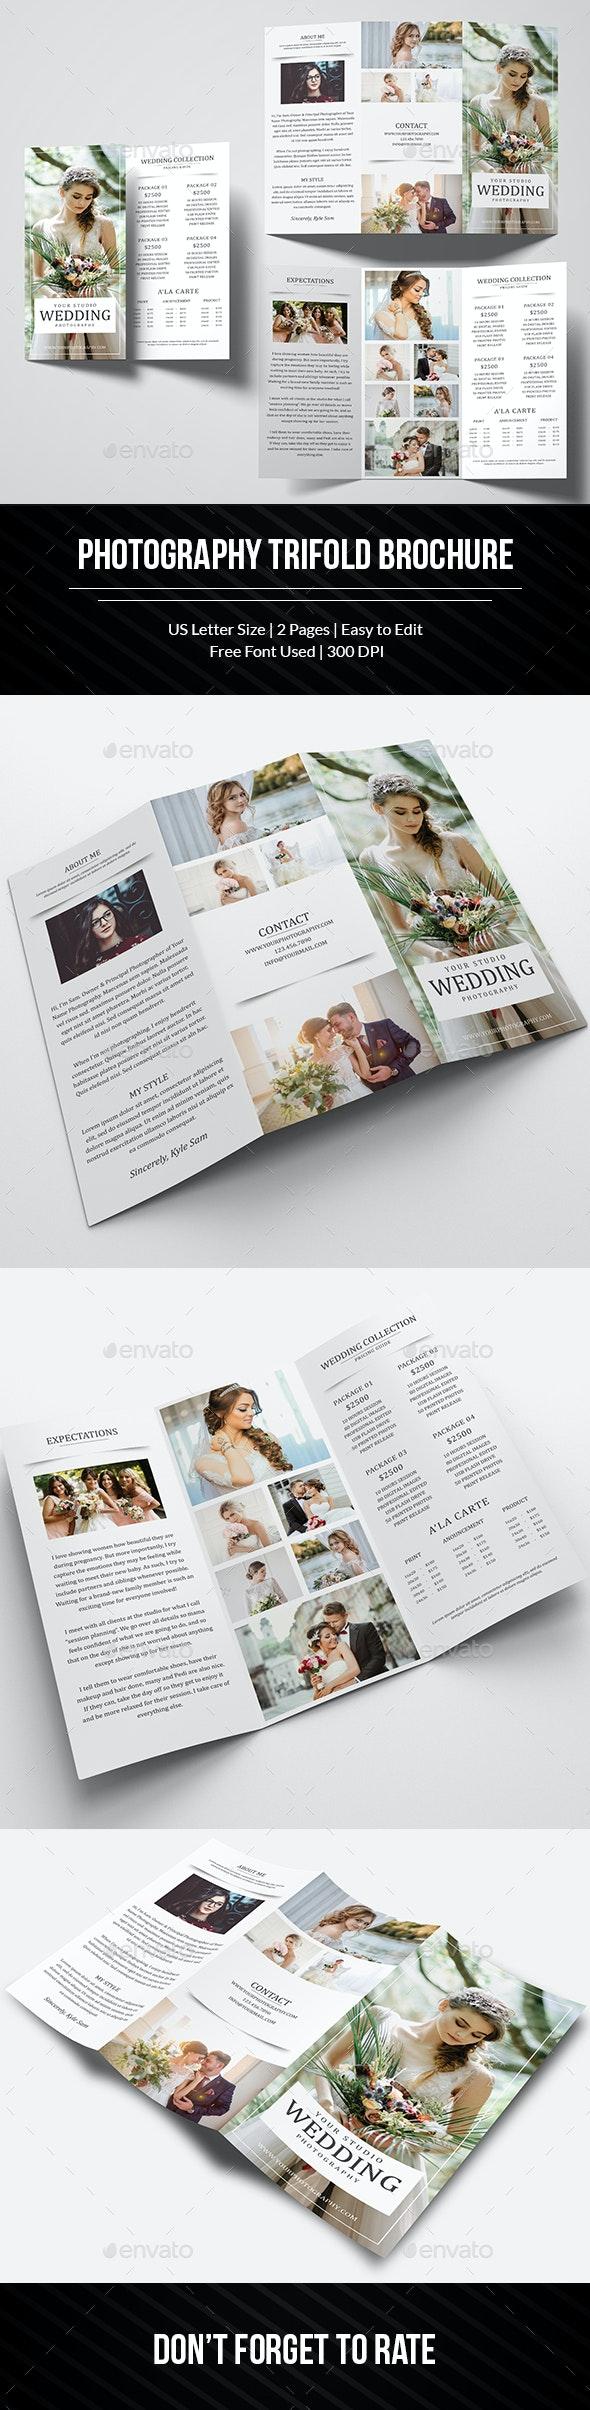 Wedding Photography Trifold Brochure - Brochures Print Templates